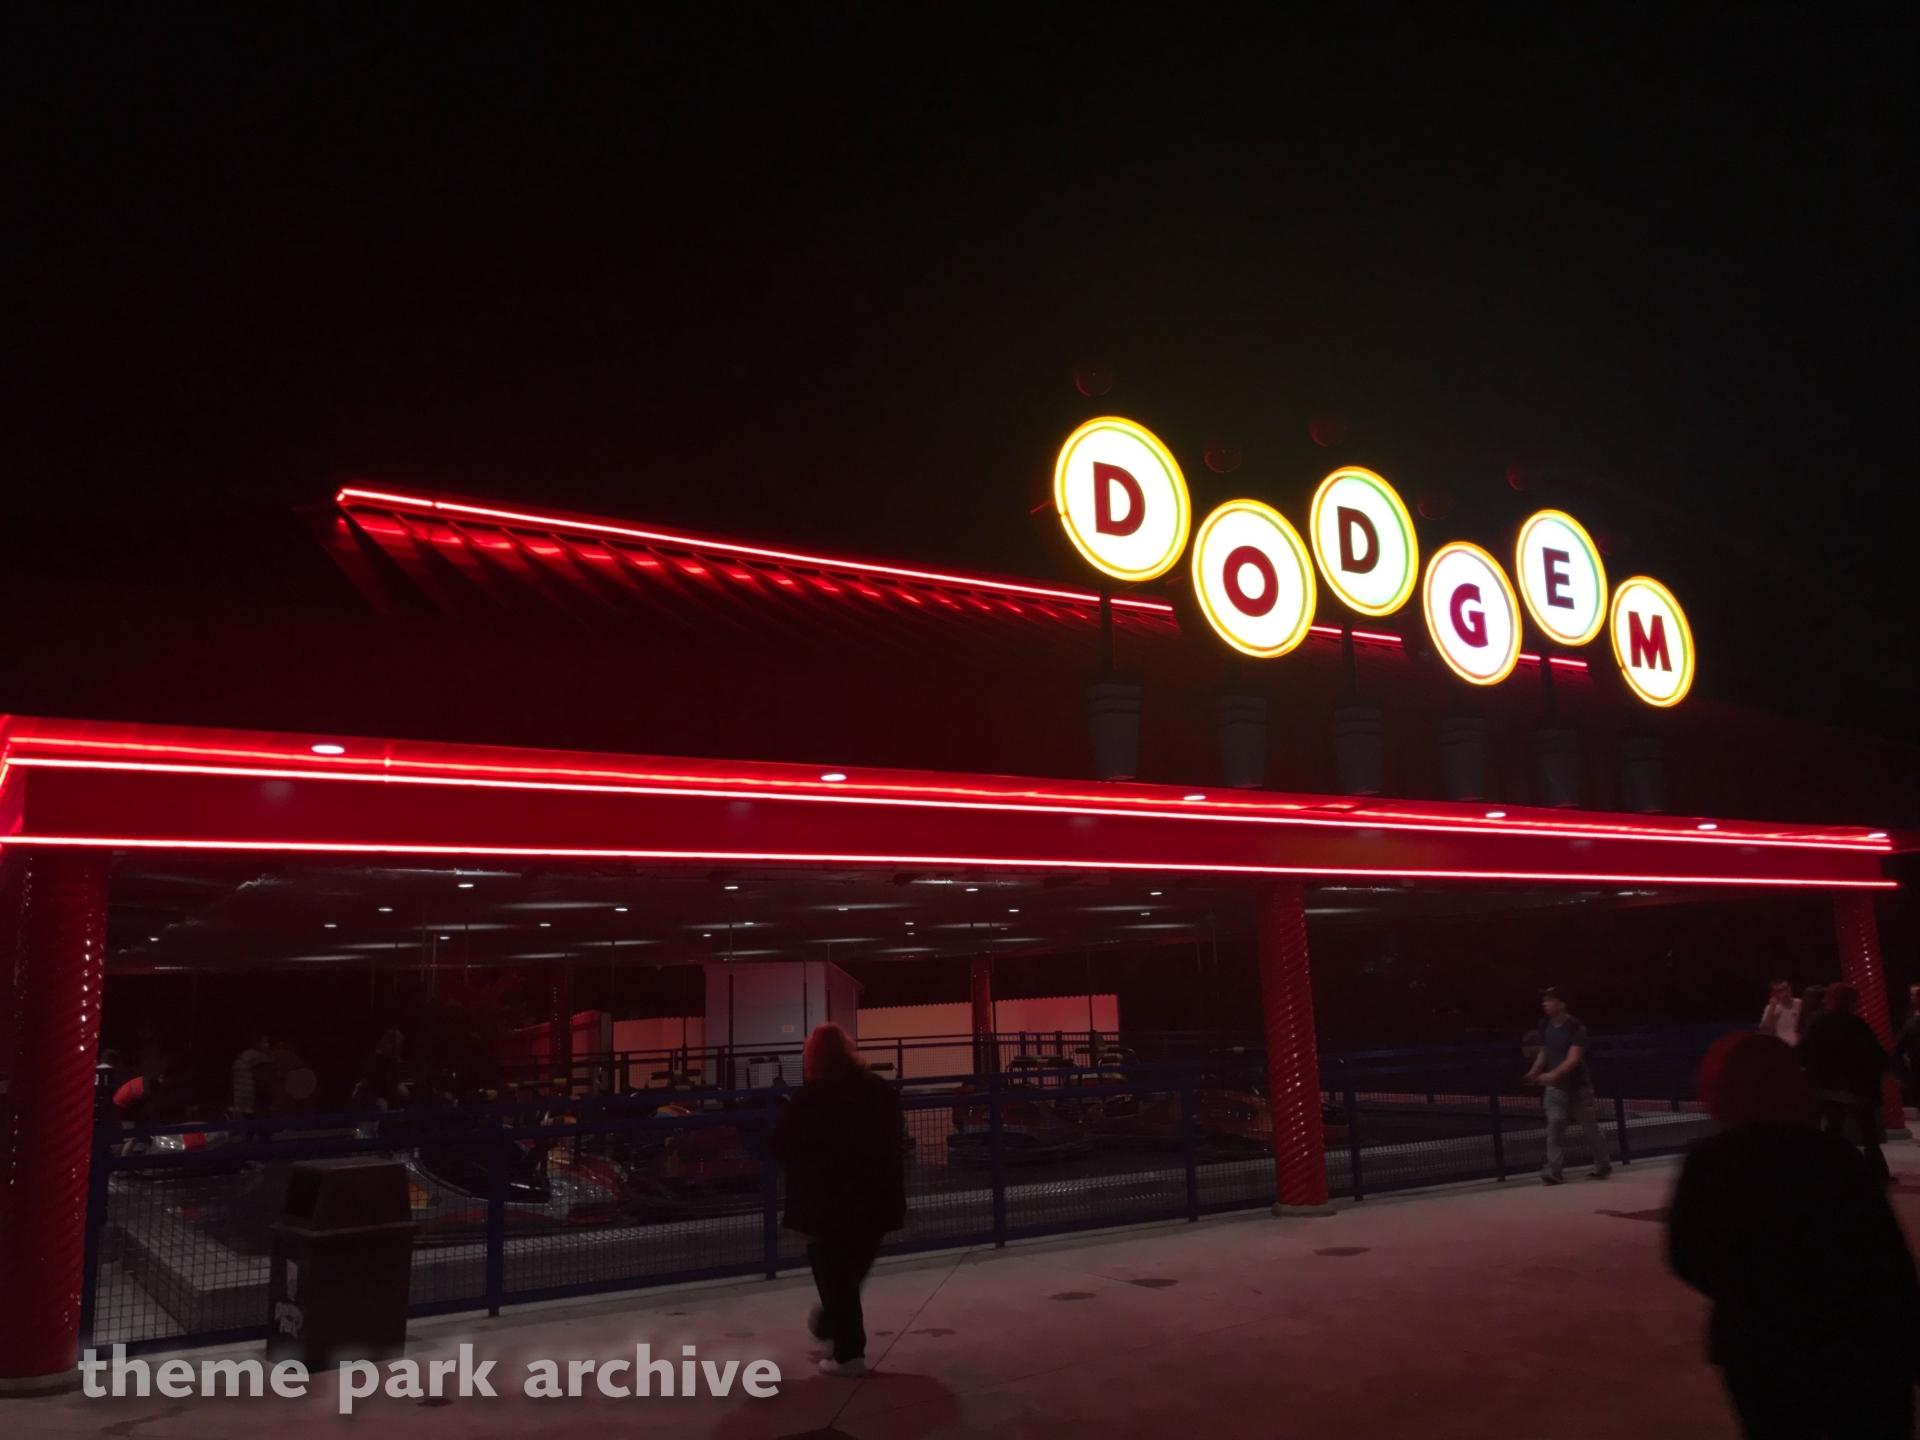 Dodgem at Dorney Park